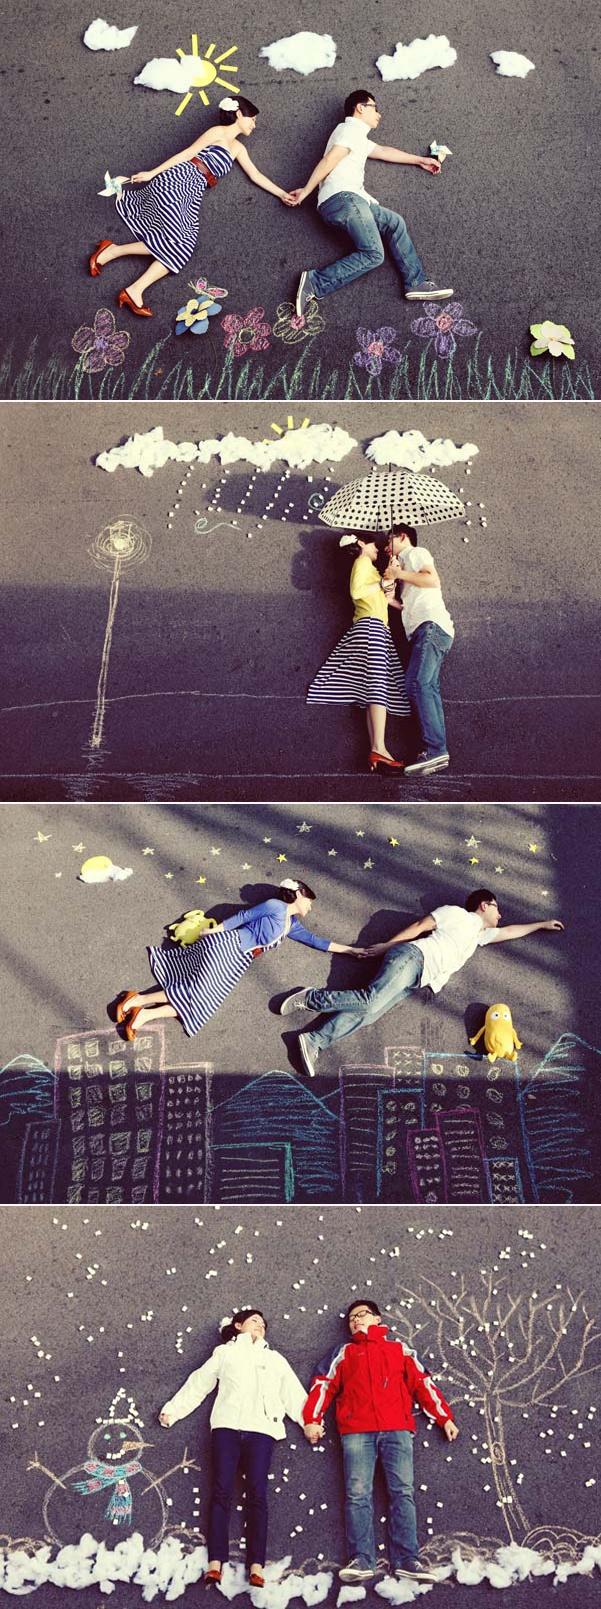 Chalk drawing engagement photos #engagement #getmarried #jevelweddingplanning